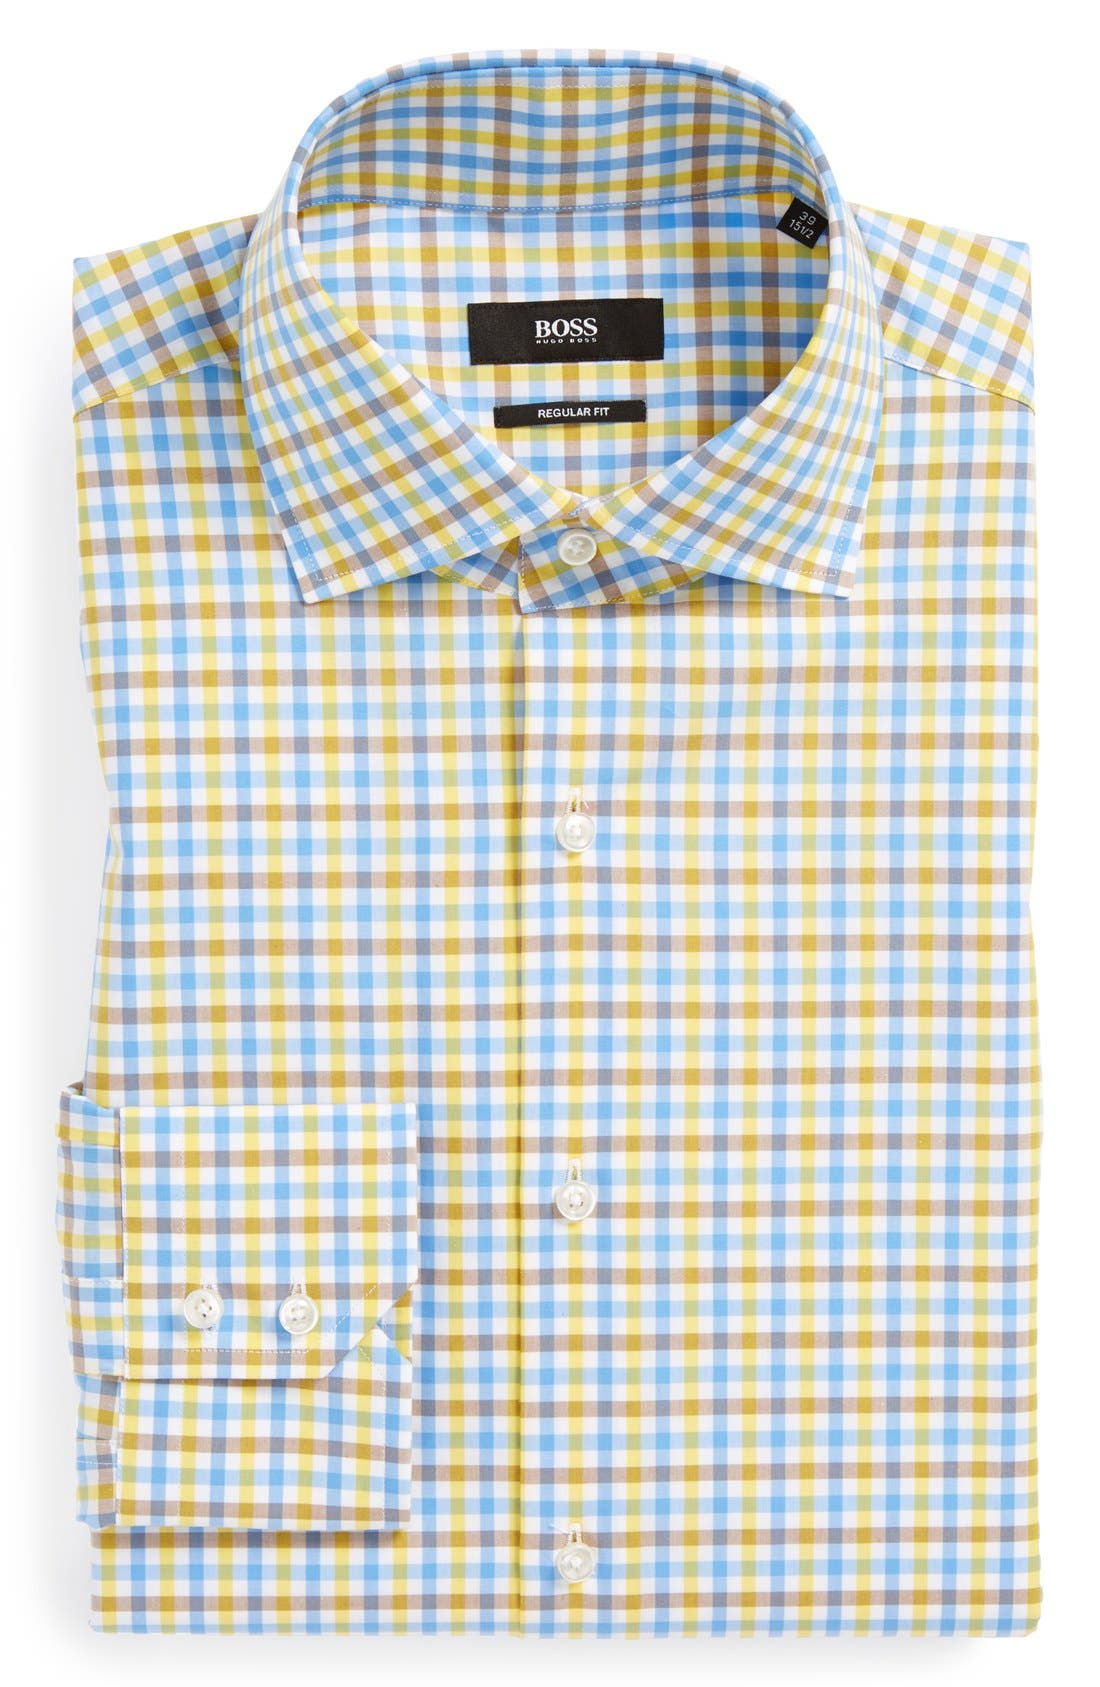 Alternate Image 1 Selected - BOSS HUGO BOSS 'Gerald' WW Regular Fit Check Dress Shirt